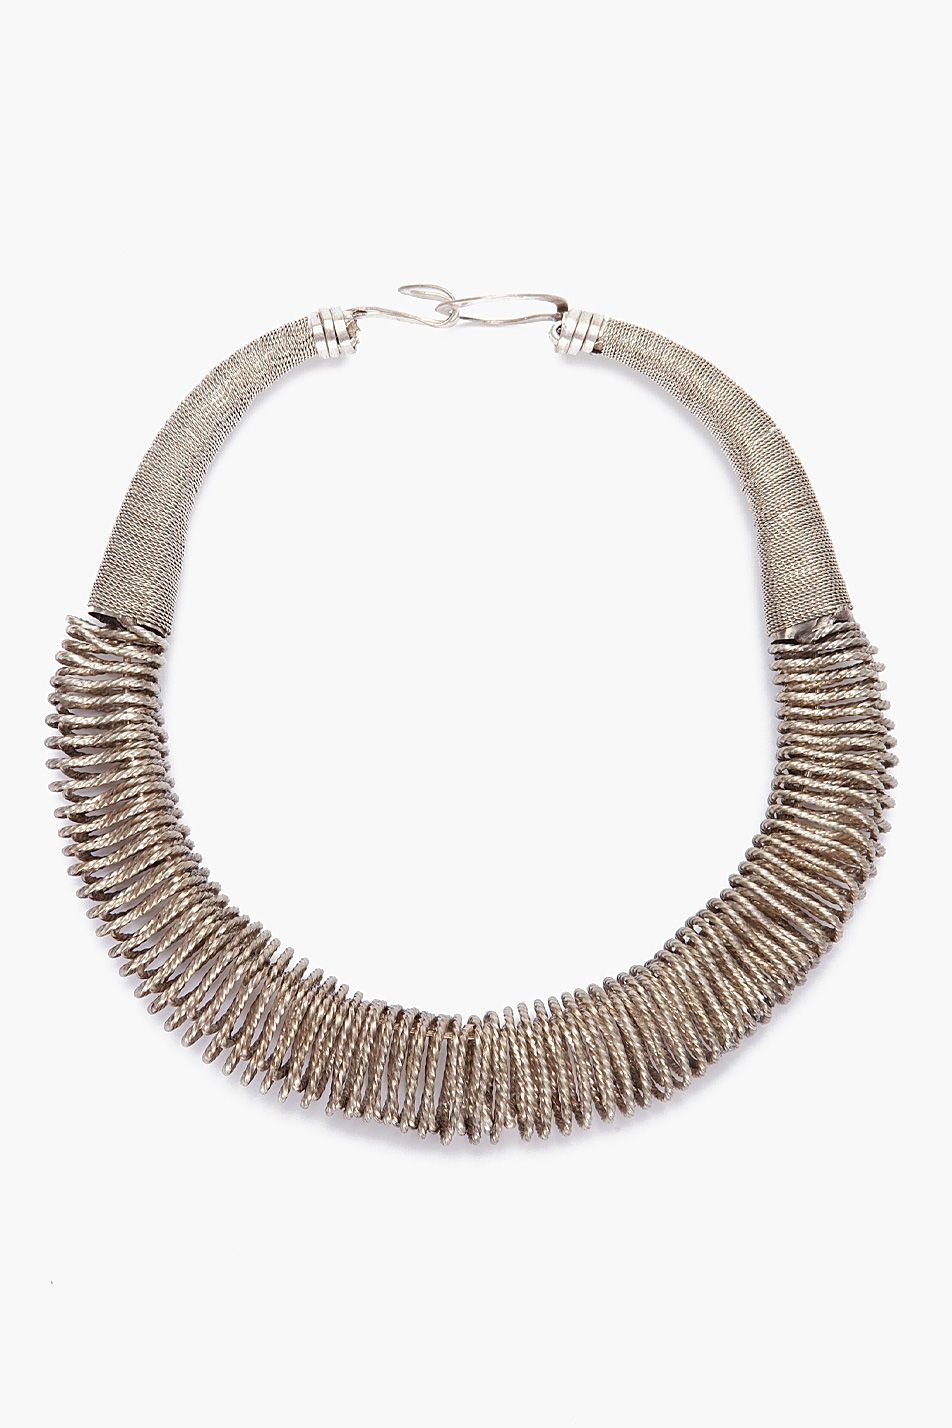 malene birger necklace